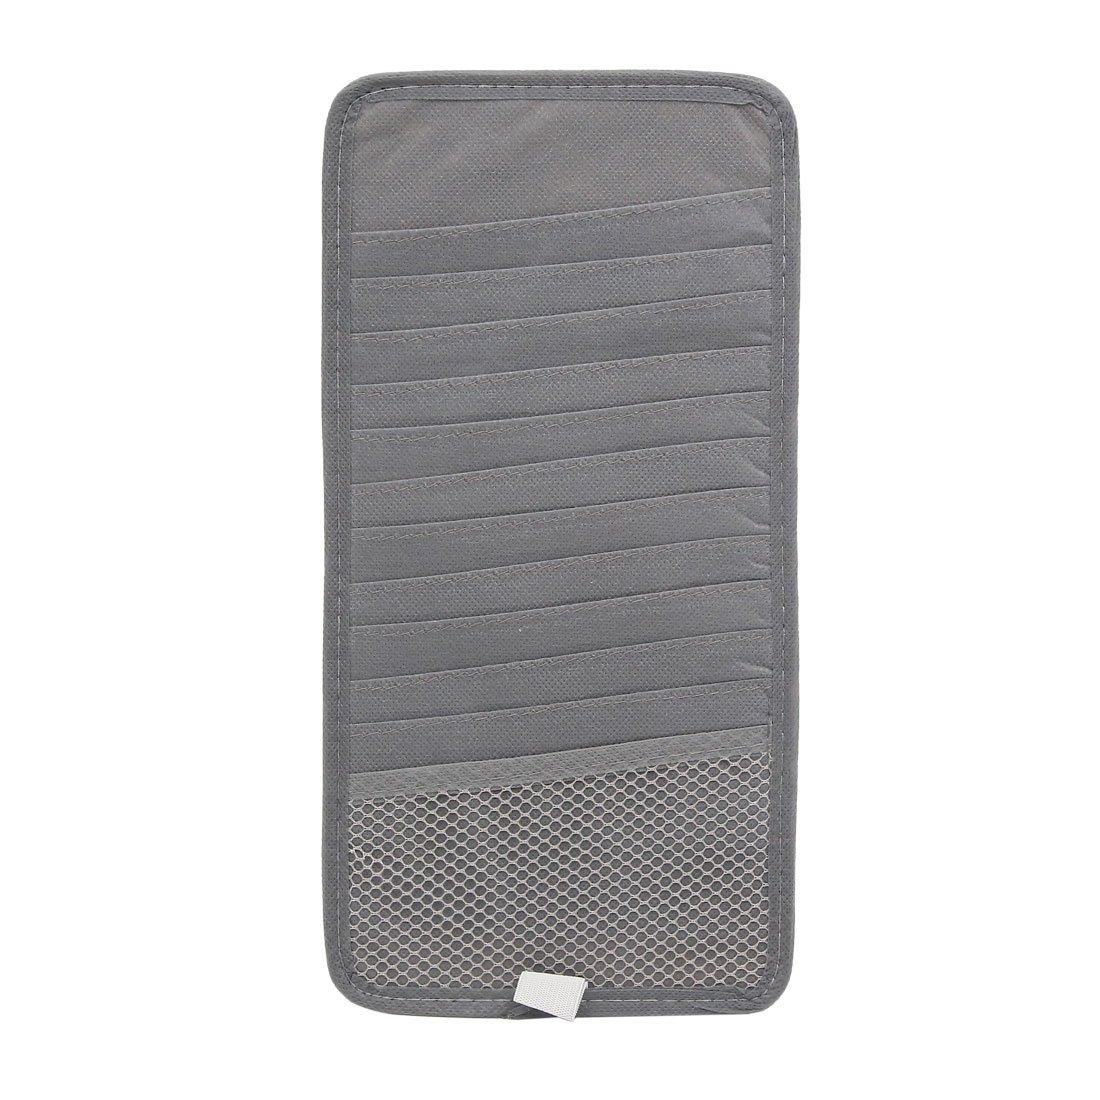 uxcell 2Pcs Gray Car Sun Visor 12 Disc CD DVD Case Wallet Storage Holder Organizer